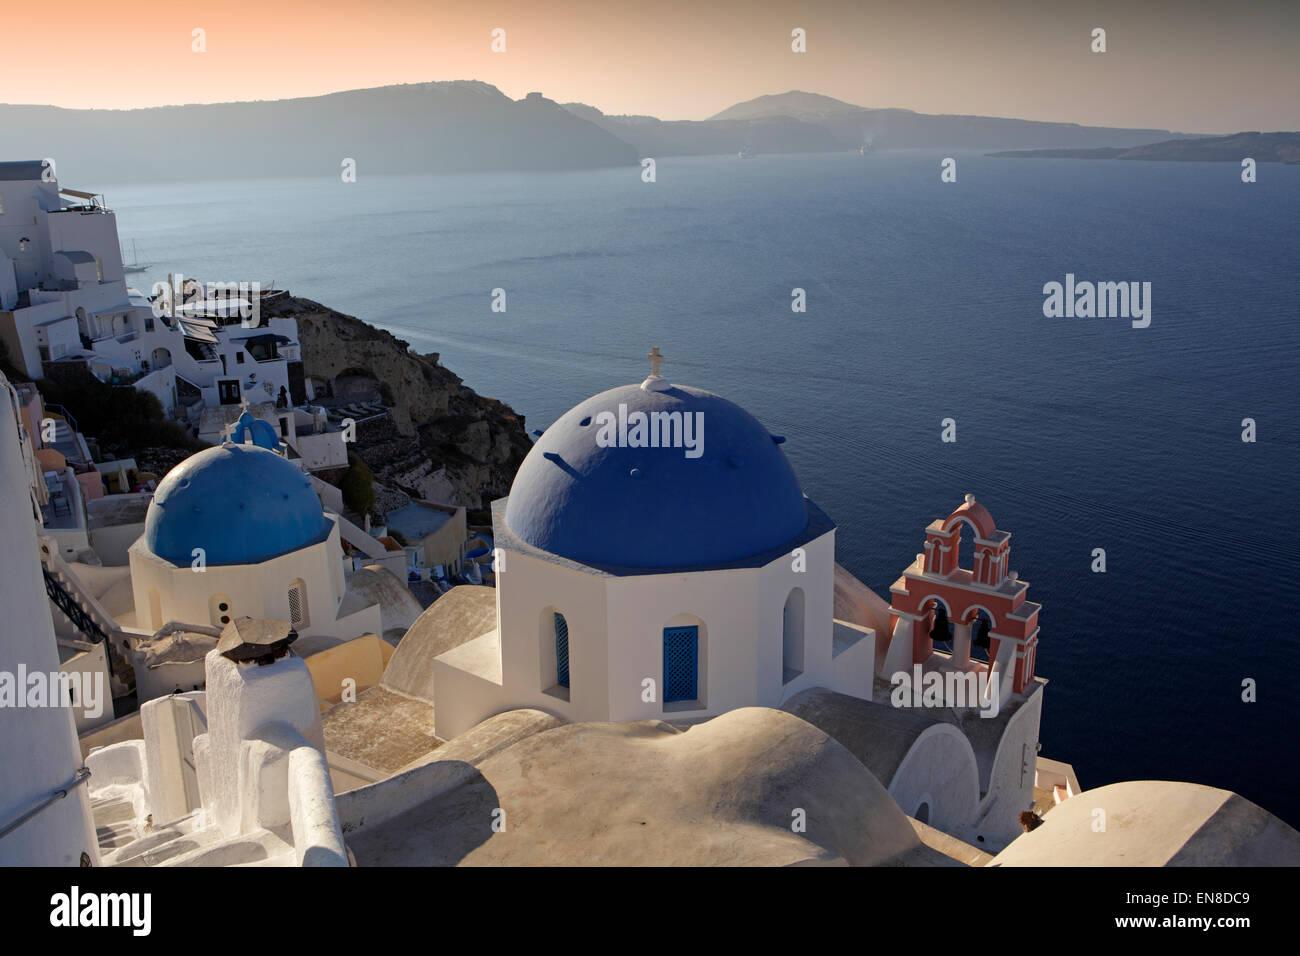 Traditional church in Oia, Santorini, Greece - Stock Image